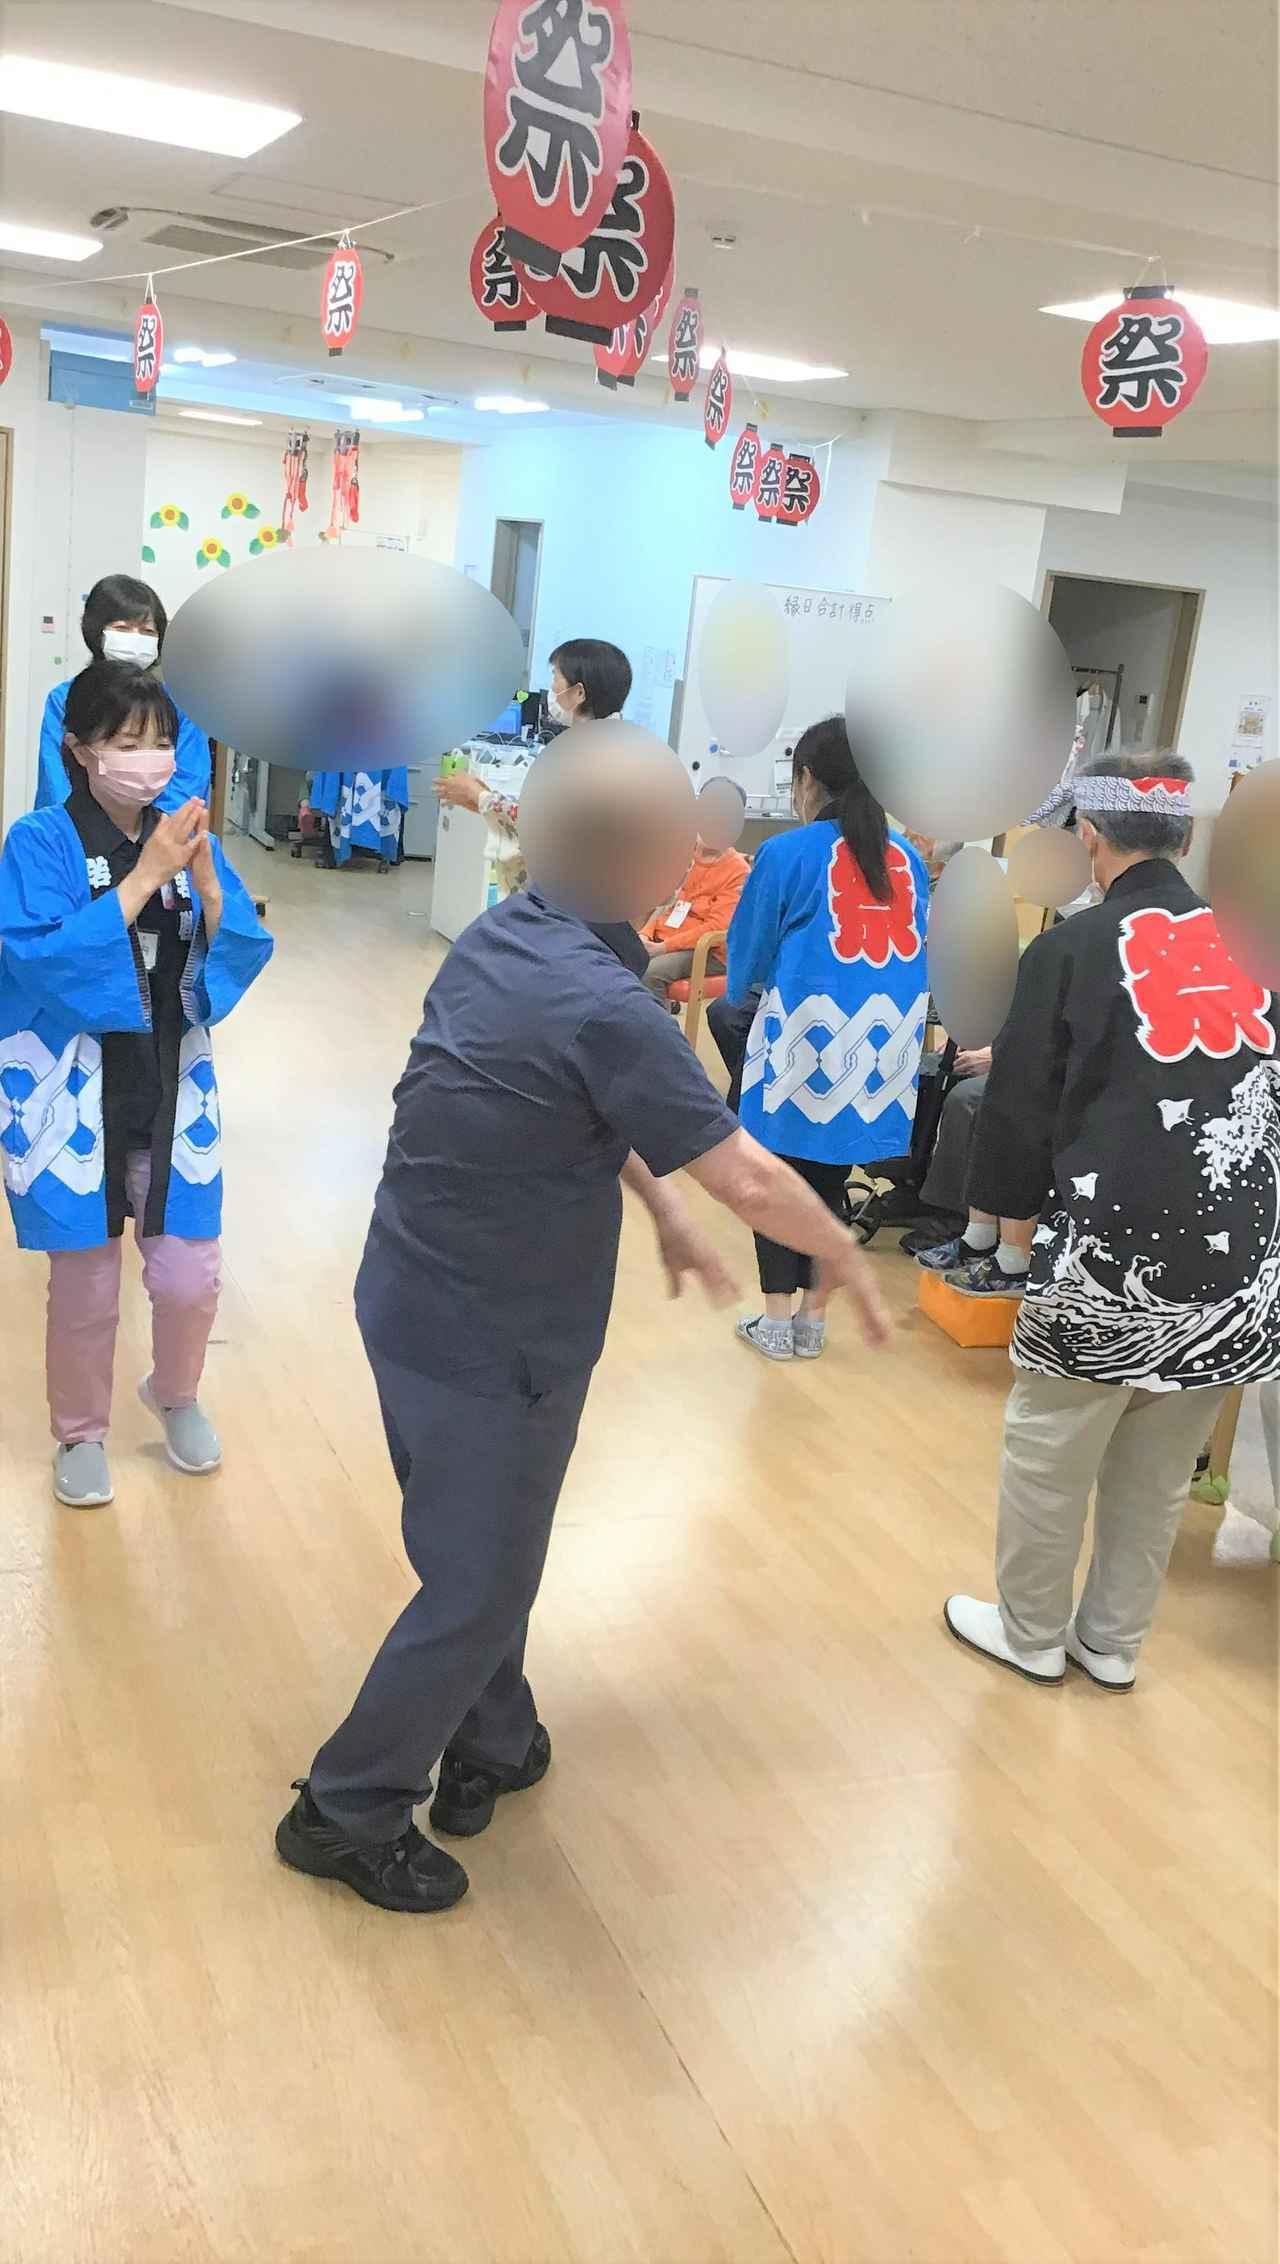 画像3: 夏祭り(小平)2日目